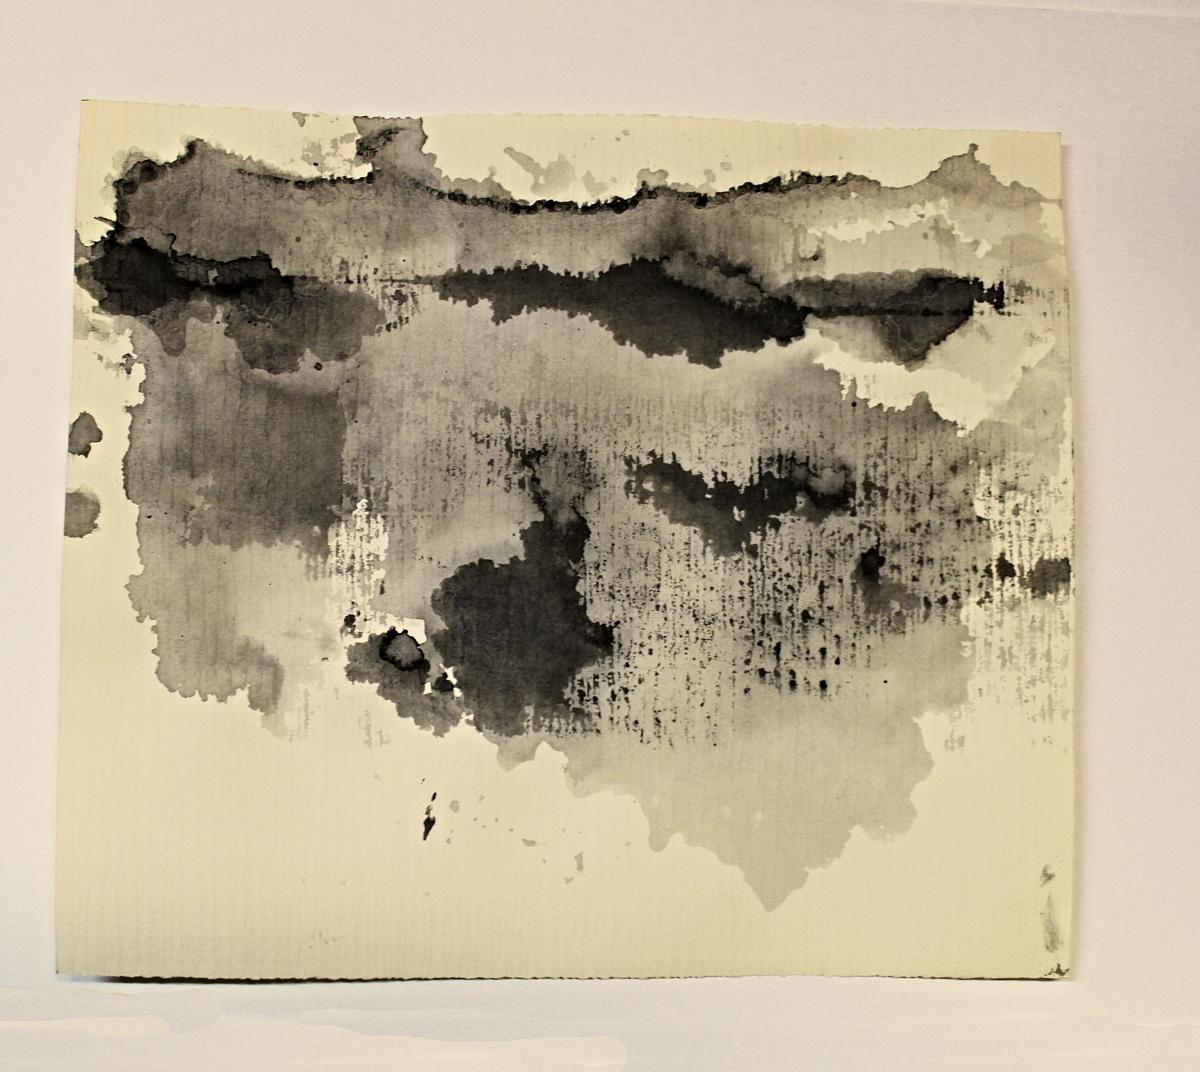 Monotypes and Monoprints